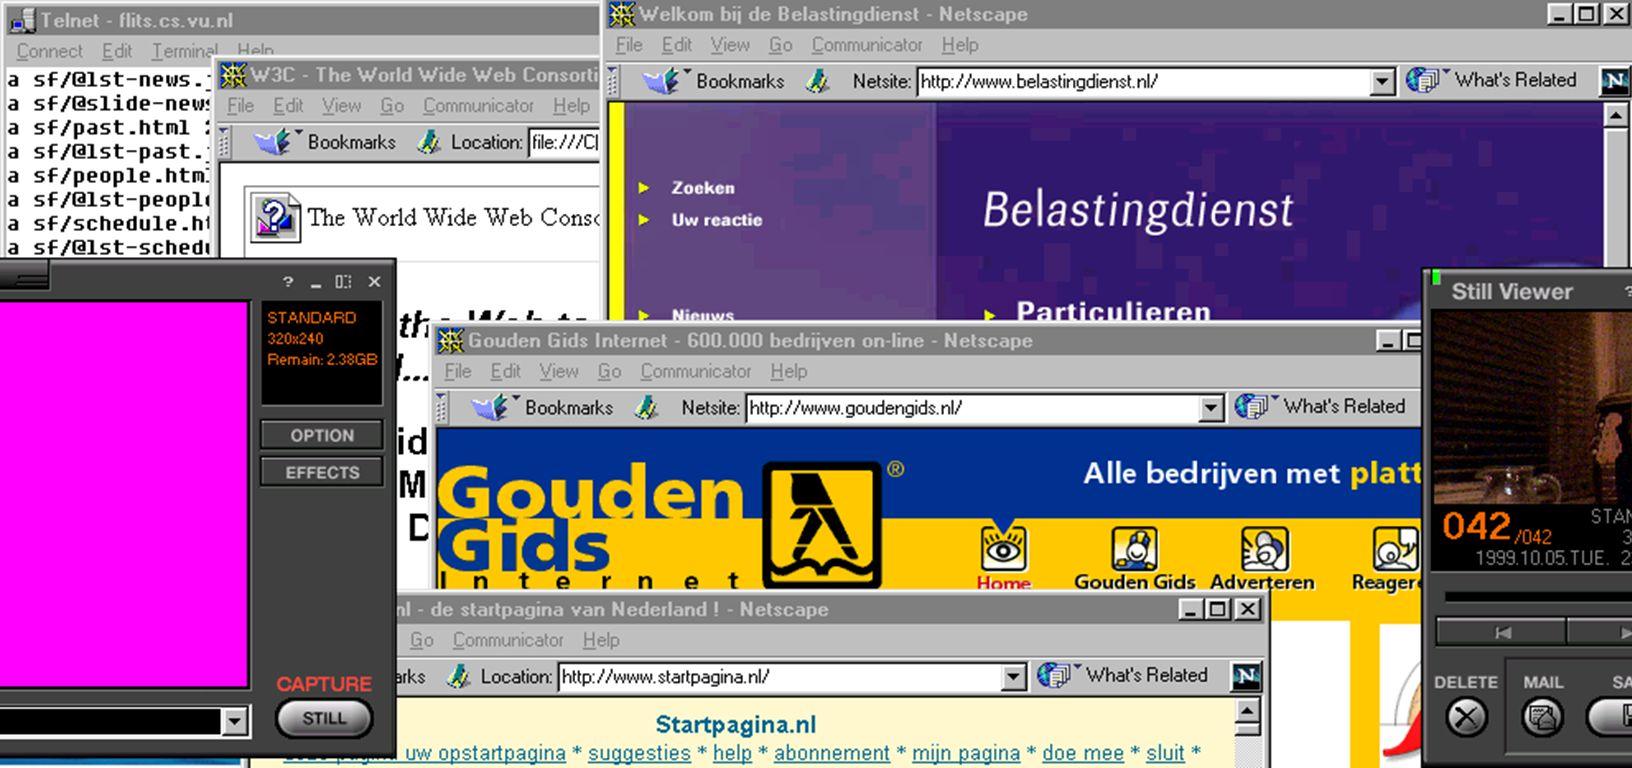 vrije Universiteit amsterdamPostacademische Cursus Informatie Technologie The Application Infrastructure The world around you is changing